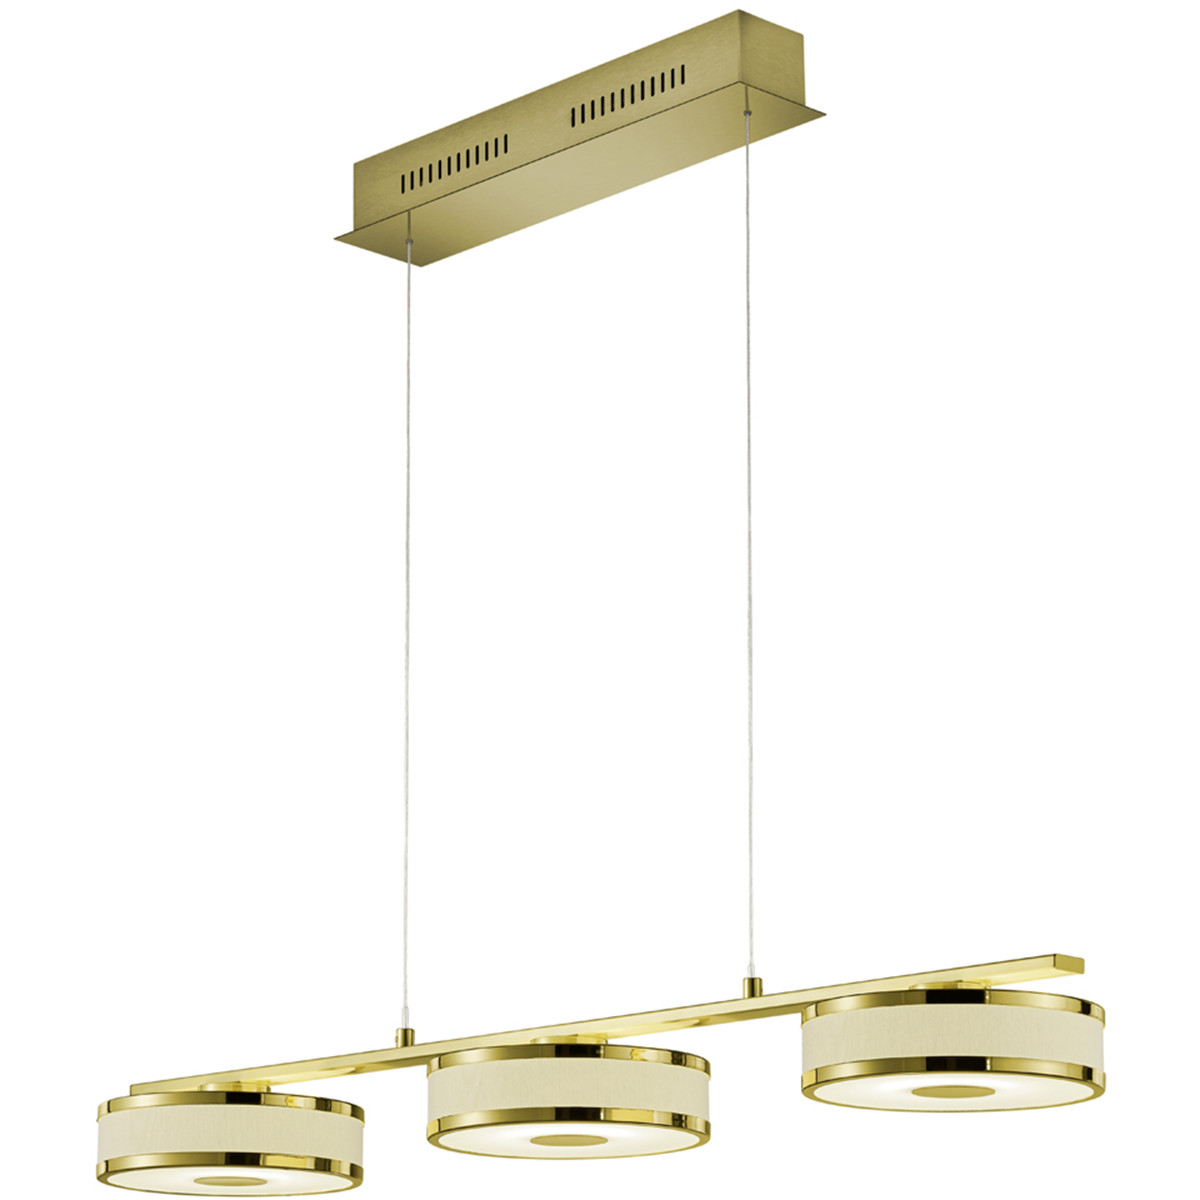 LED Hanglamp - Trion Agiany - 21W - Warm Wit 3000K - 3-lichts - Dimbaar - Rechthoek - Mat Goud - Alu